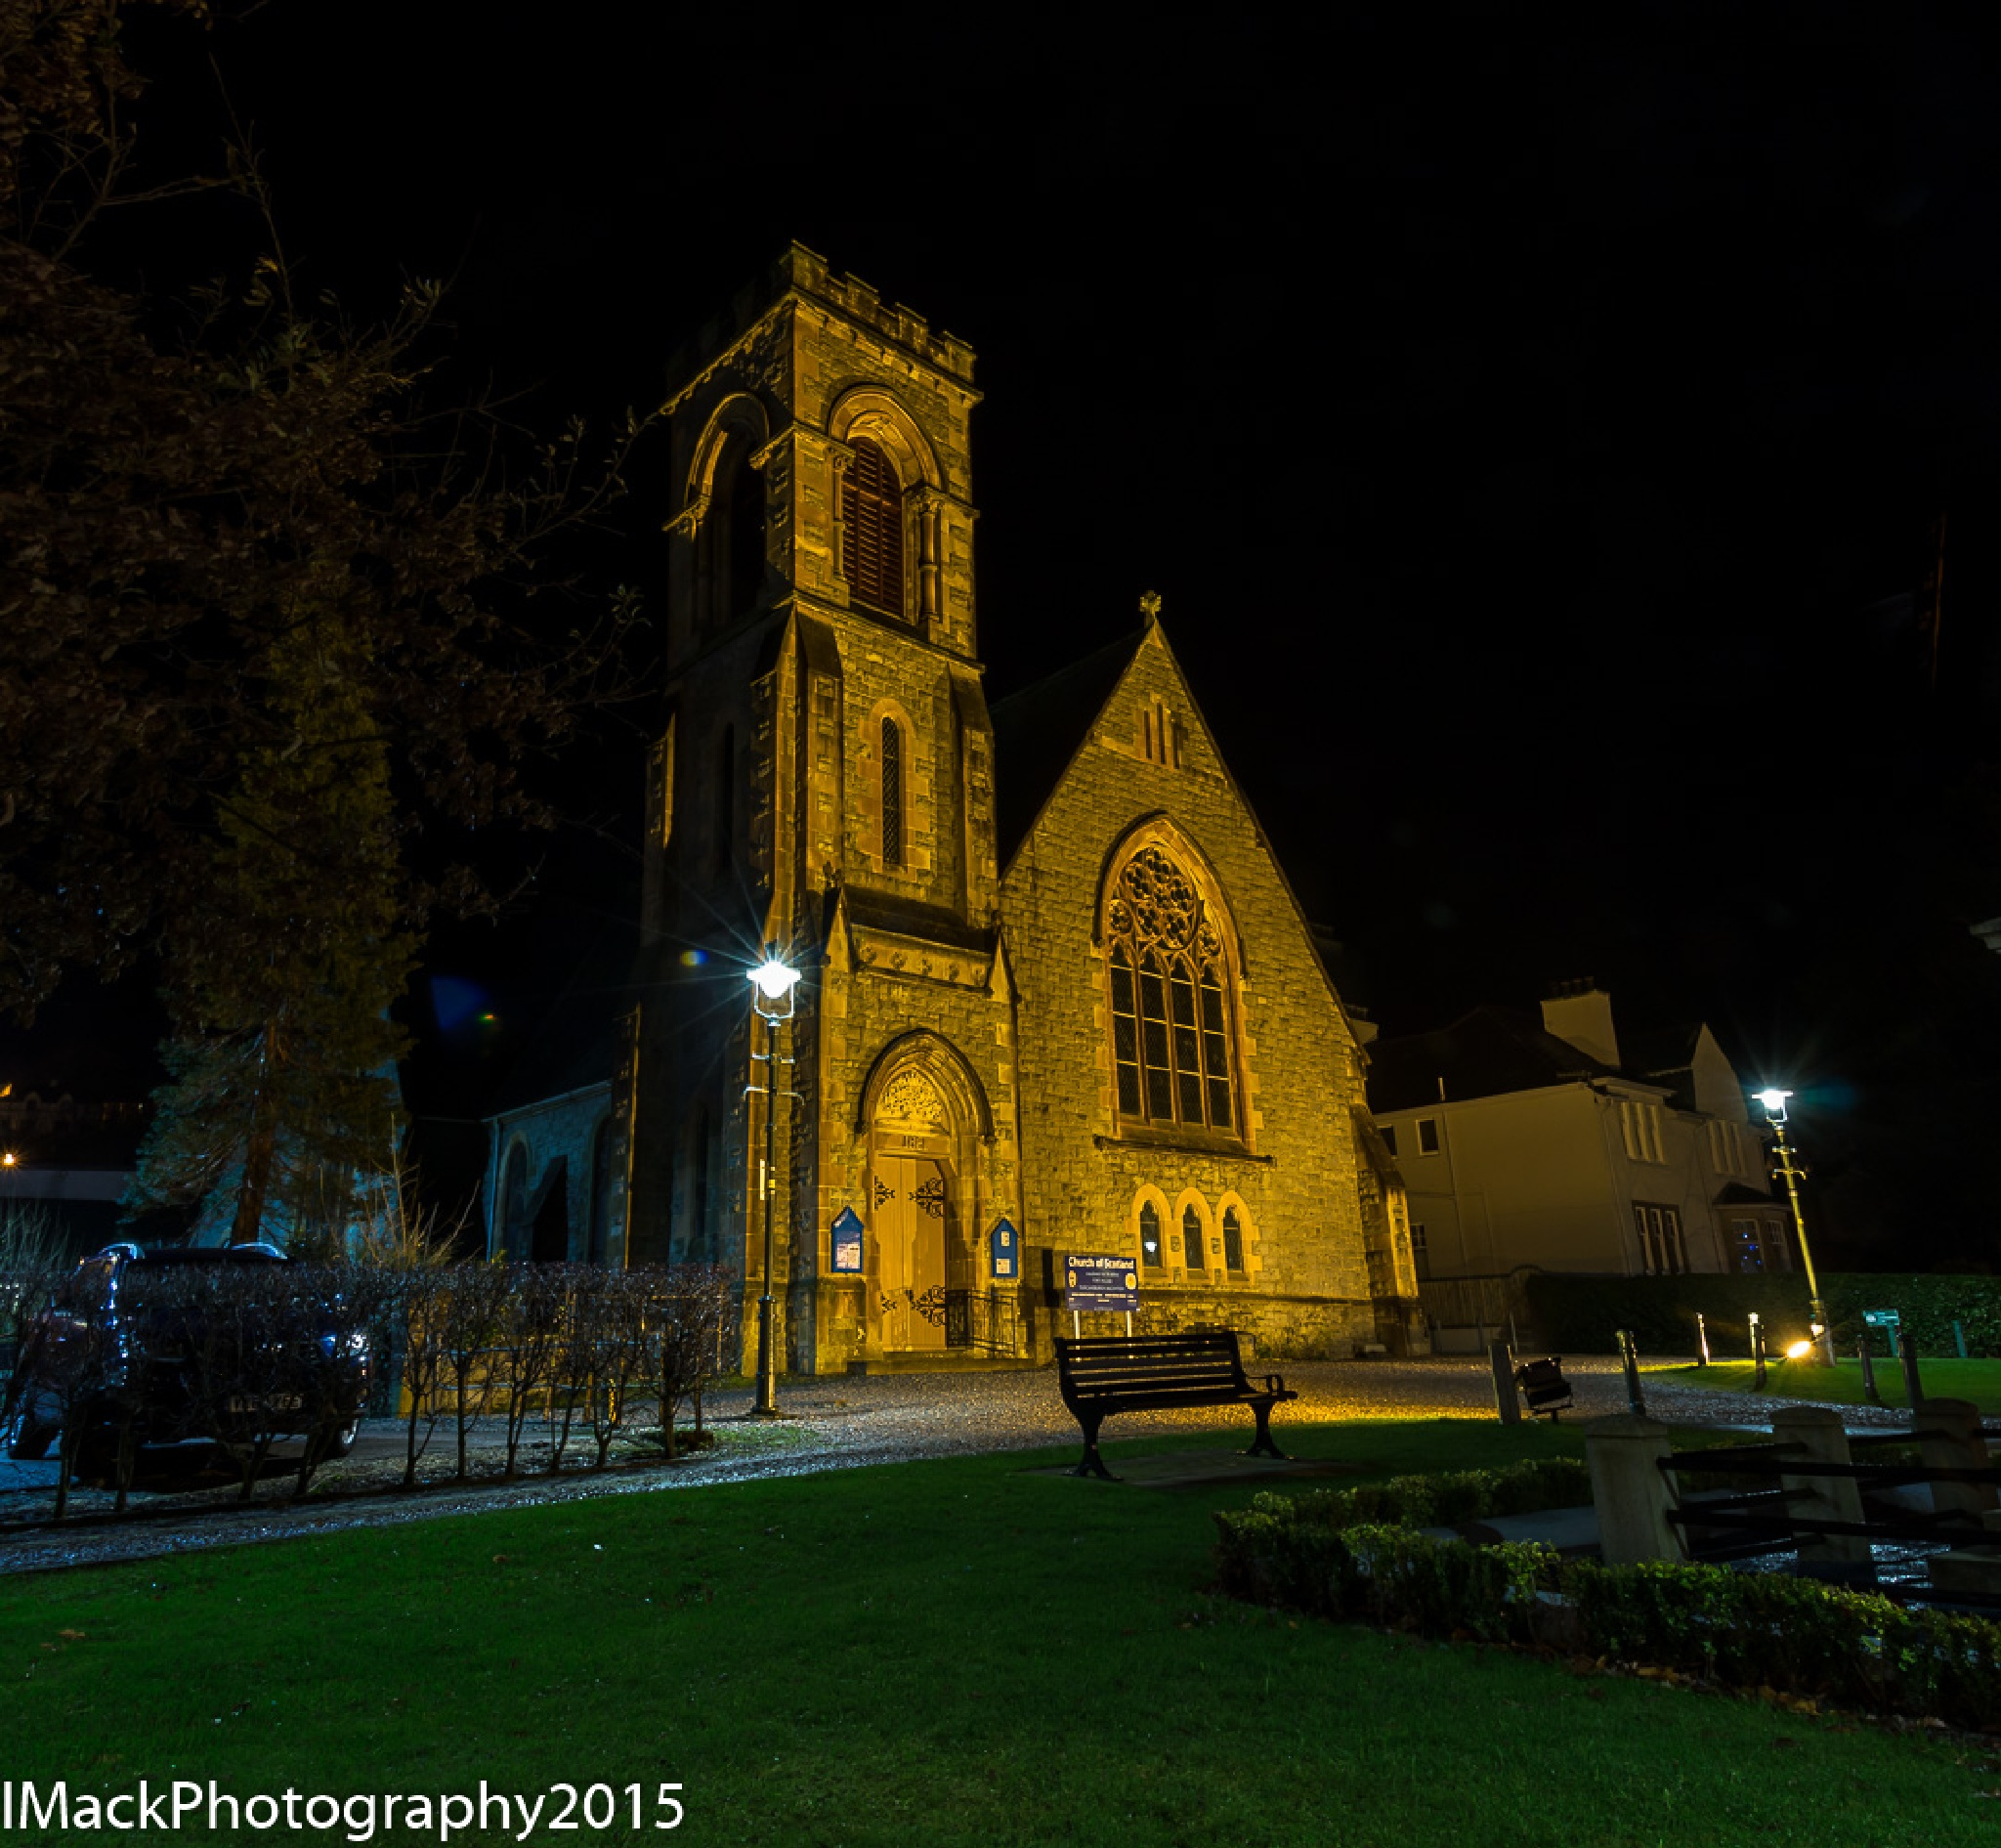 Church in early morning by Ian Mackenzie